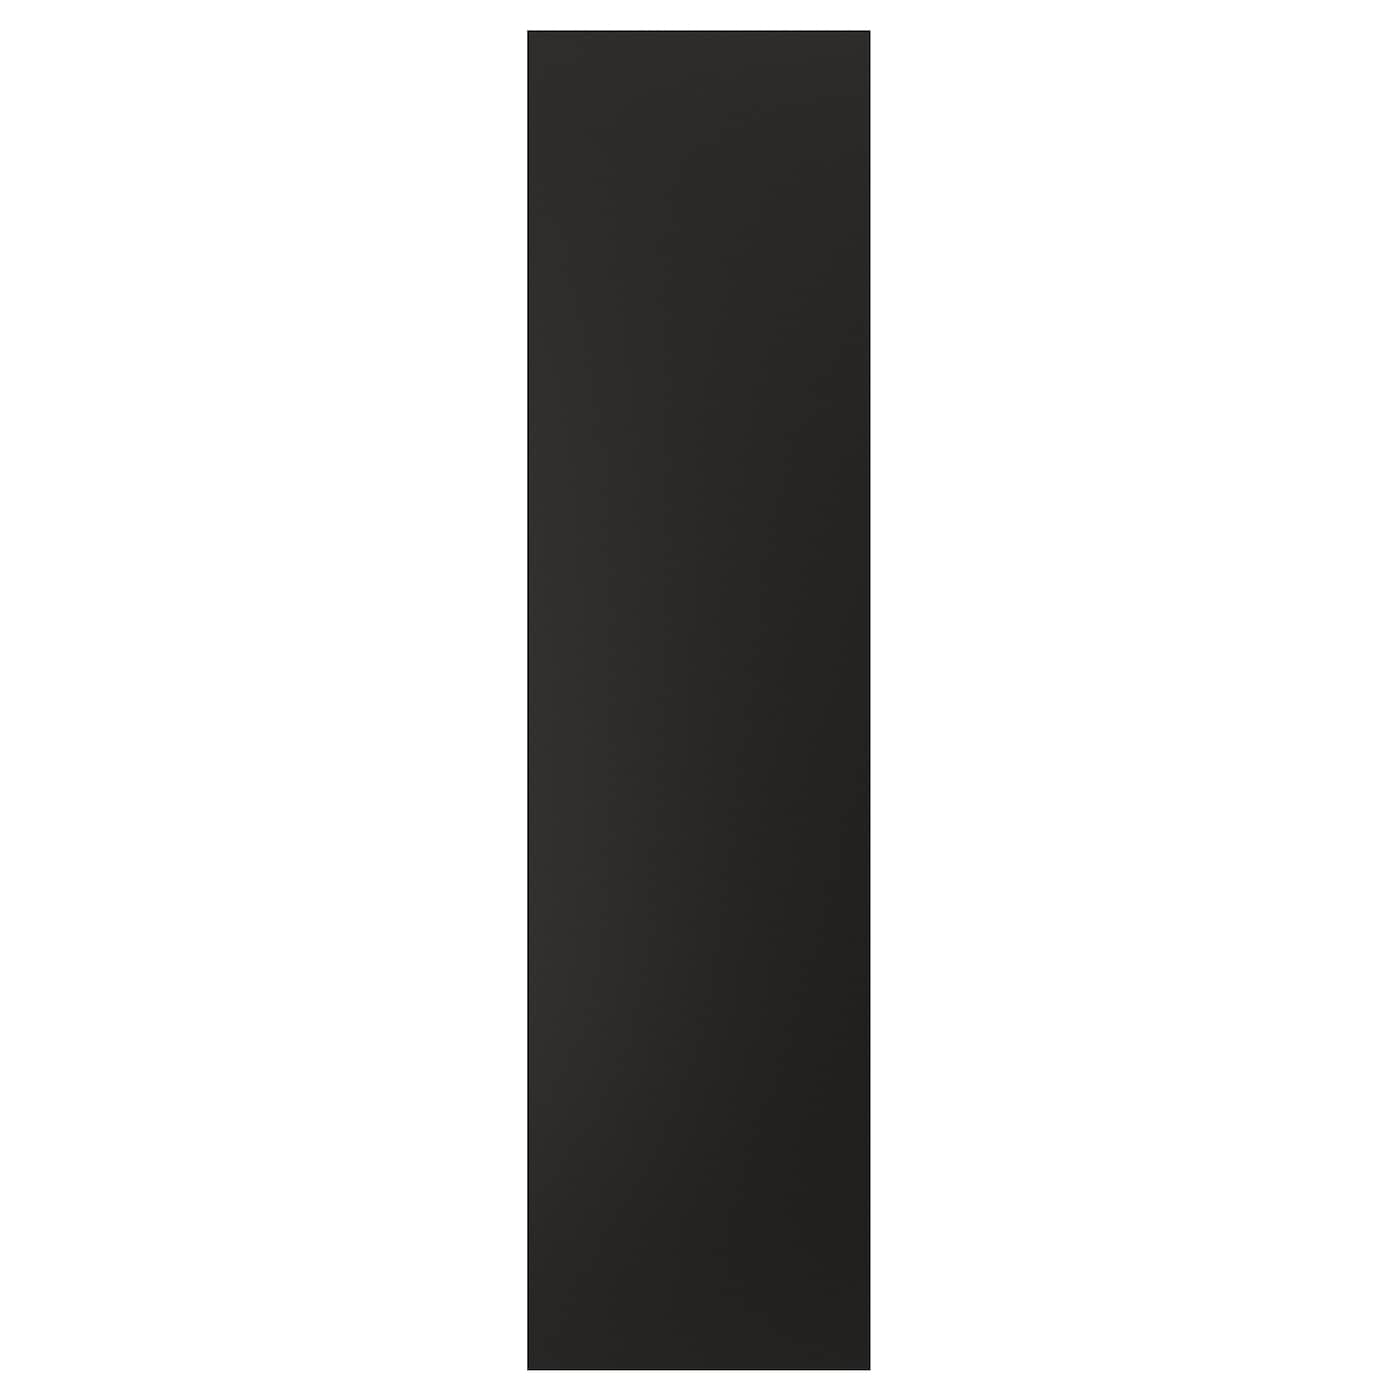 uddevalla panneau finition surf tableau noir anthracite 62 x 240 cm ikea. Black Bedroom Furniture Sets. Home Design Ideas